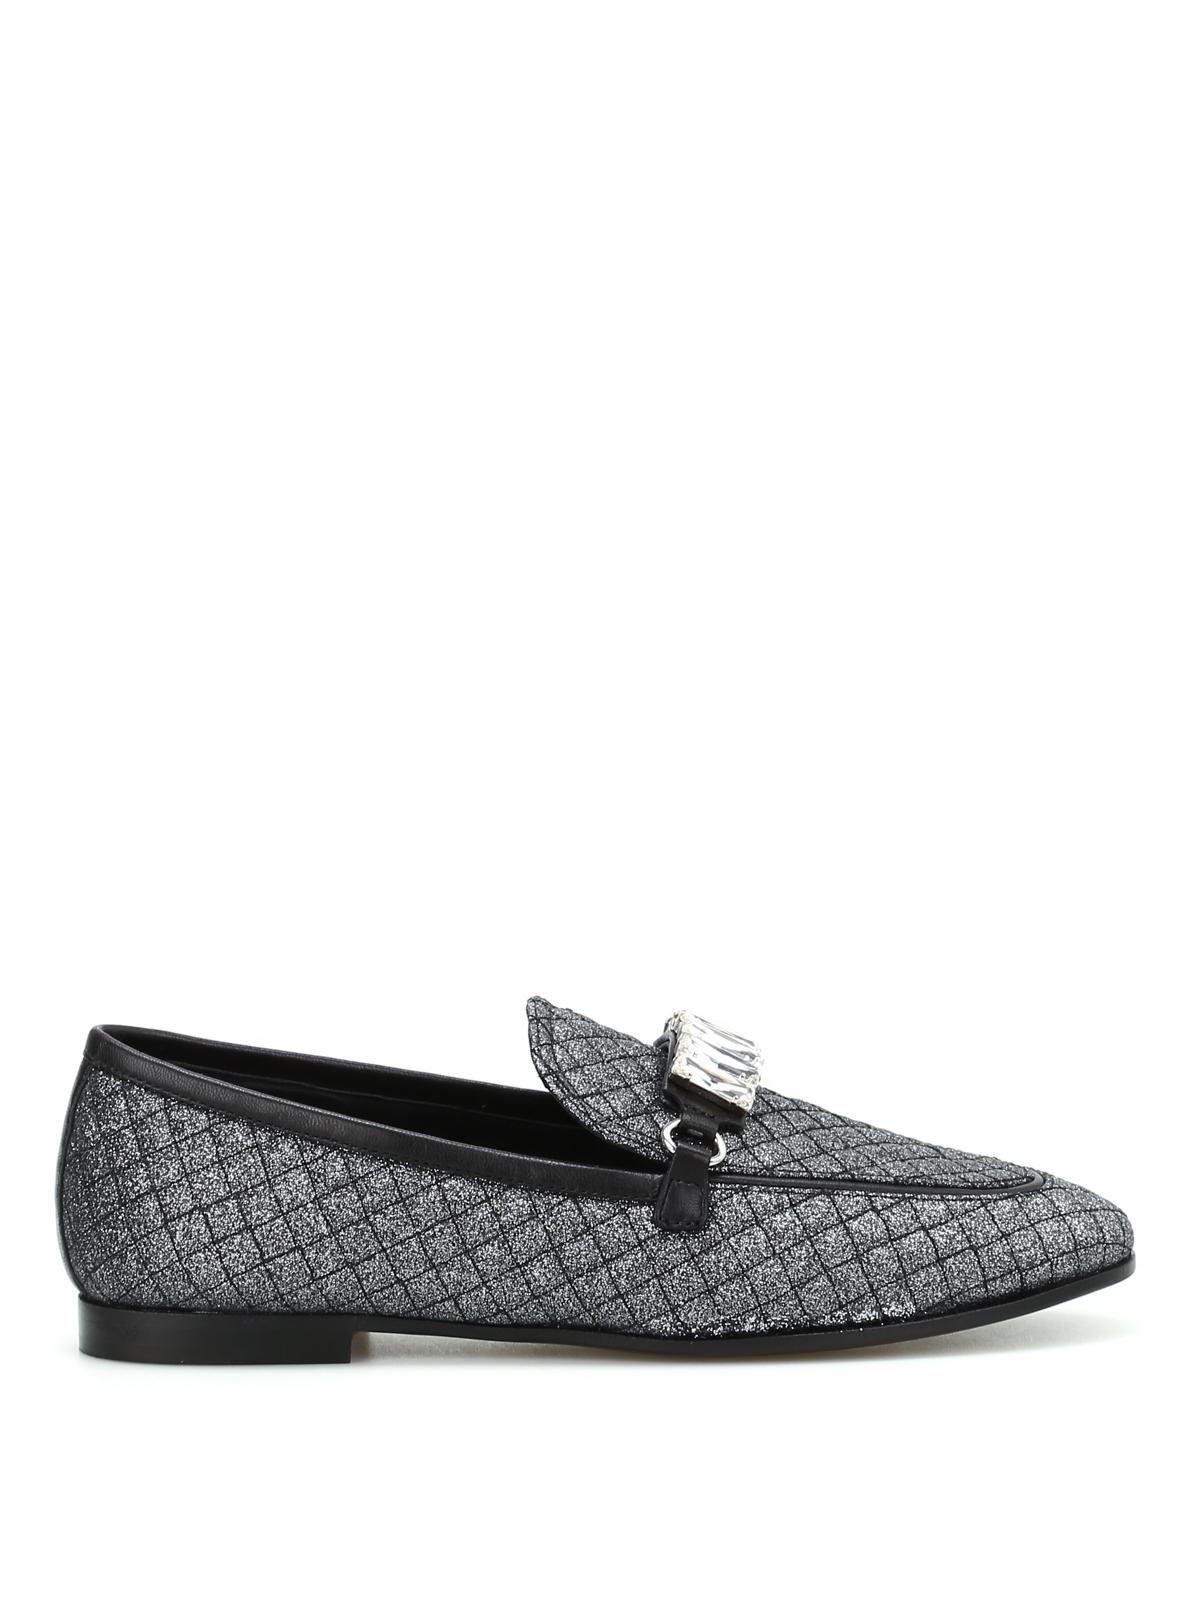 glittered loafers Giuseppe Zanotti gR2nTh6WLT